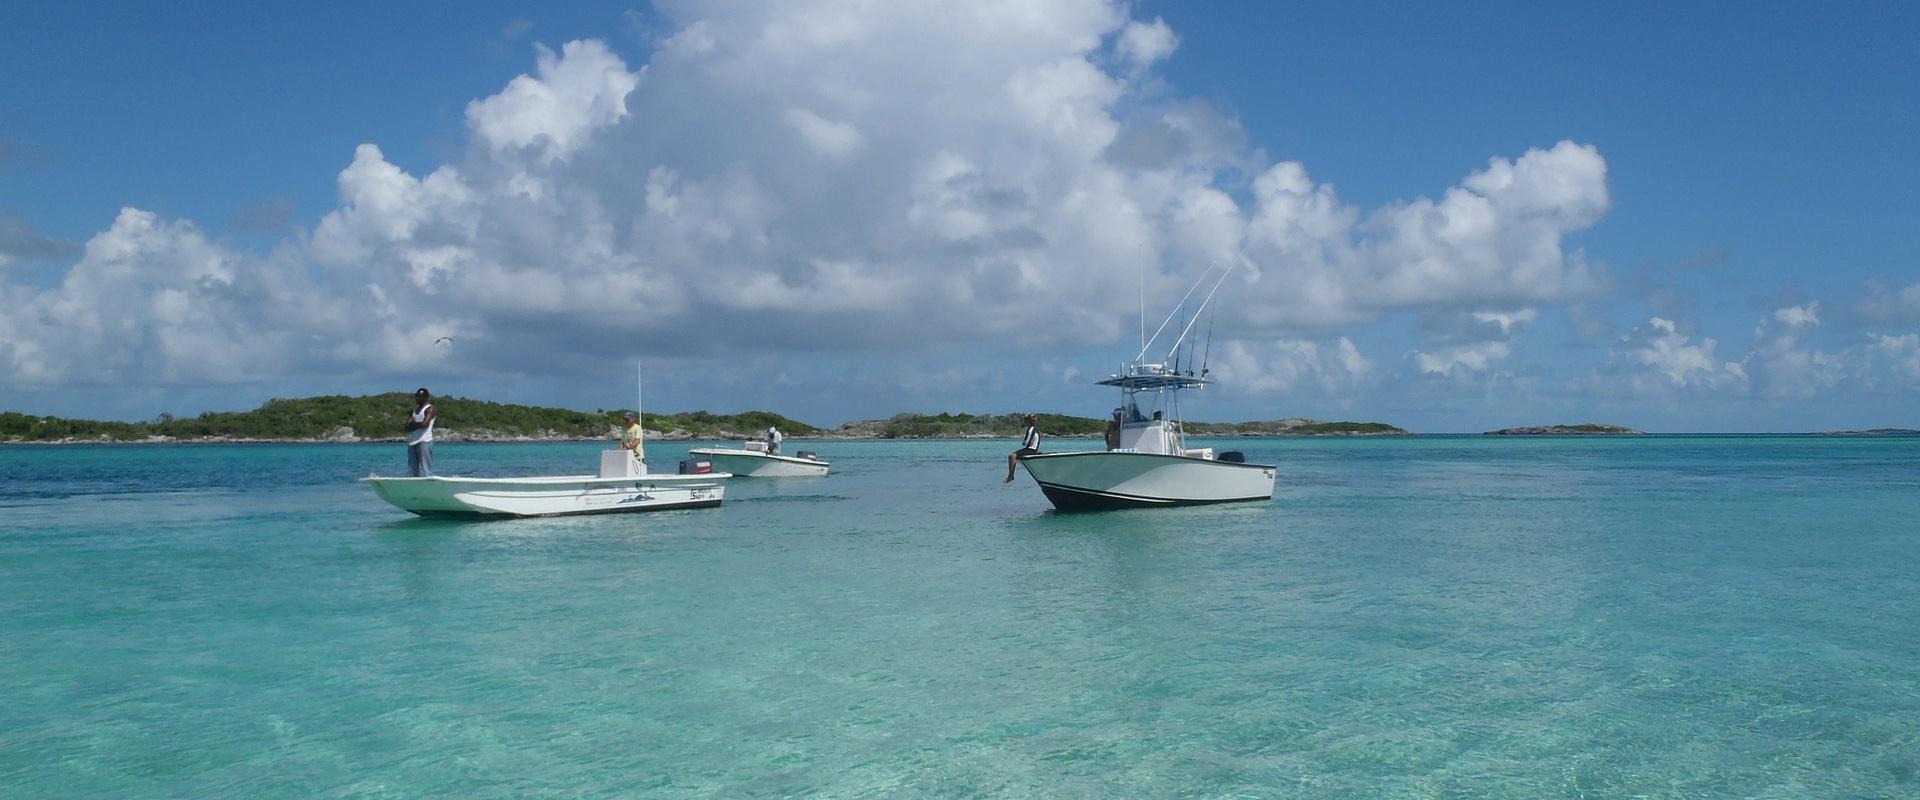 7 of Our Favorite Bahamas Marinas